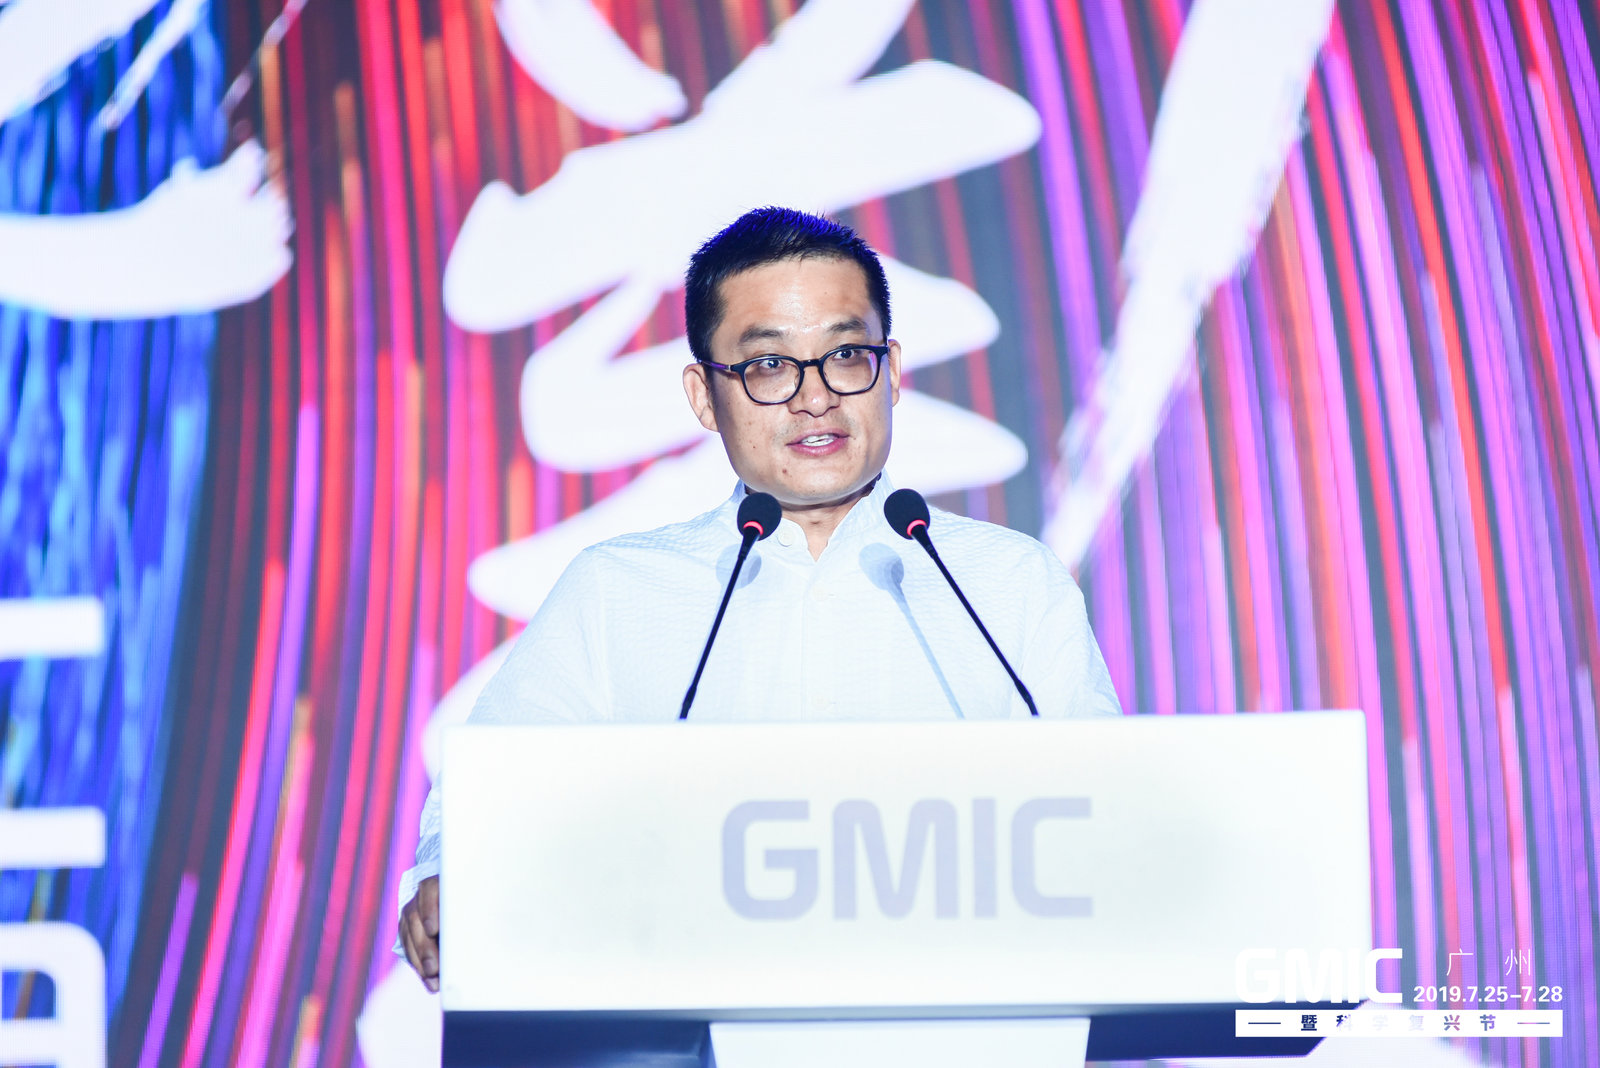 GMIC2019高山大学创办人、长城会创始人兼CEO文厨发表致辞